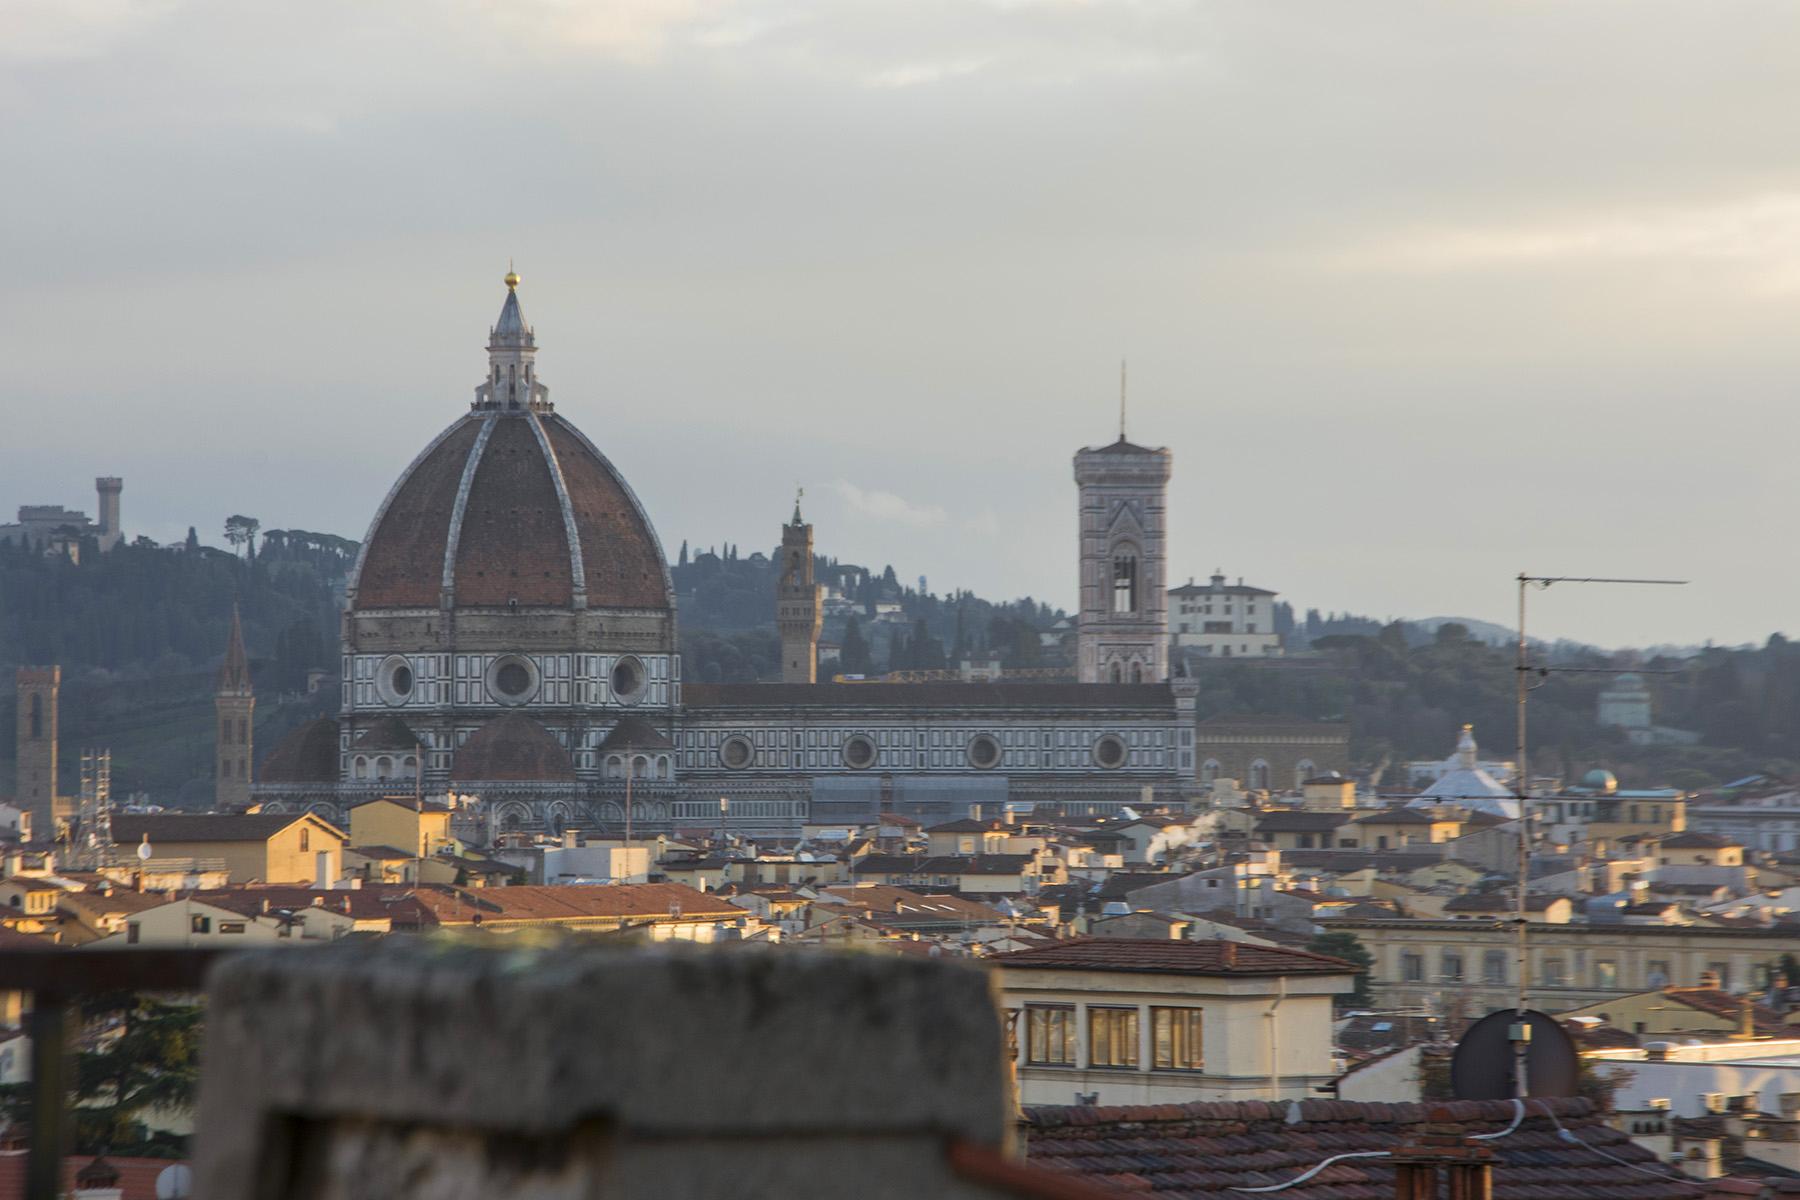 Attico in Vendita a Firenze: 5 locali, 400 mq - Foto 17